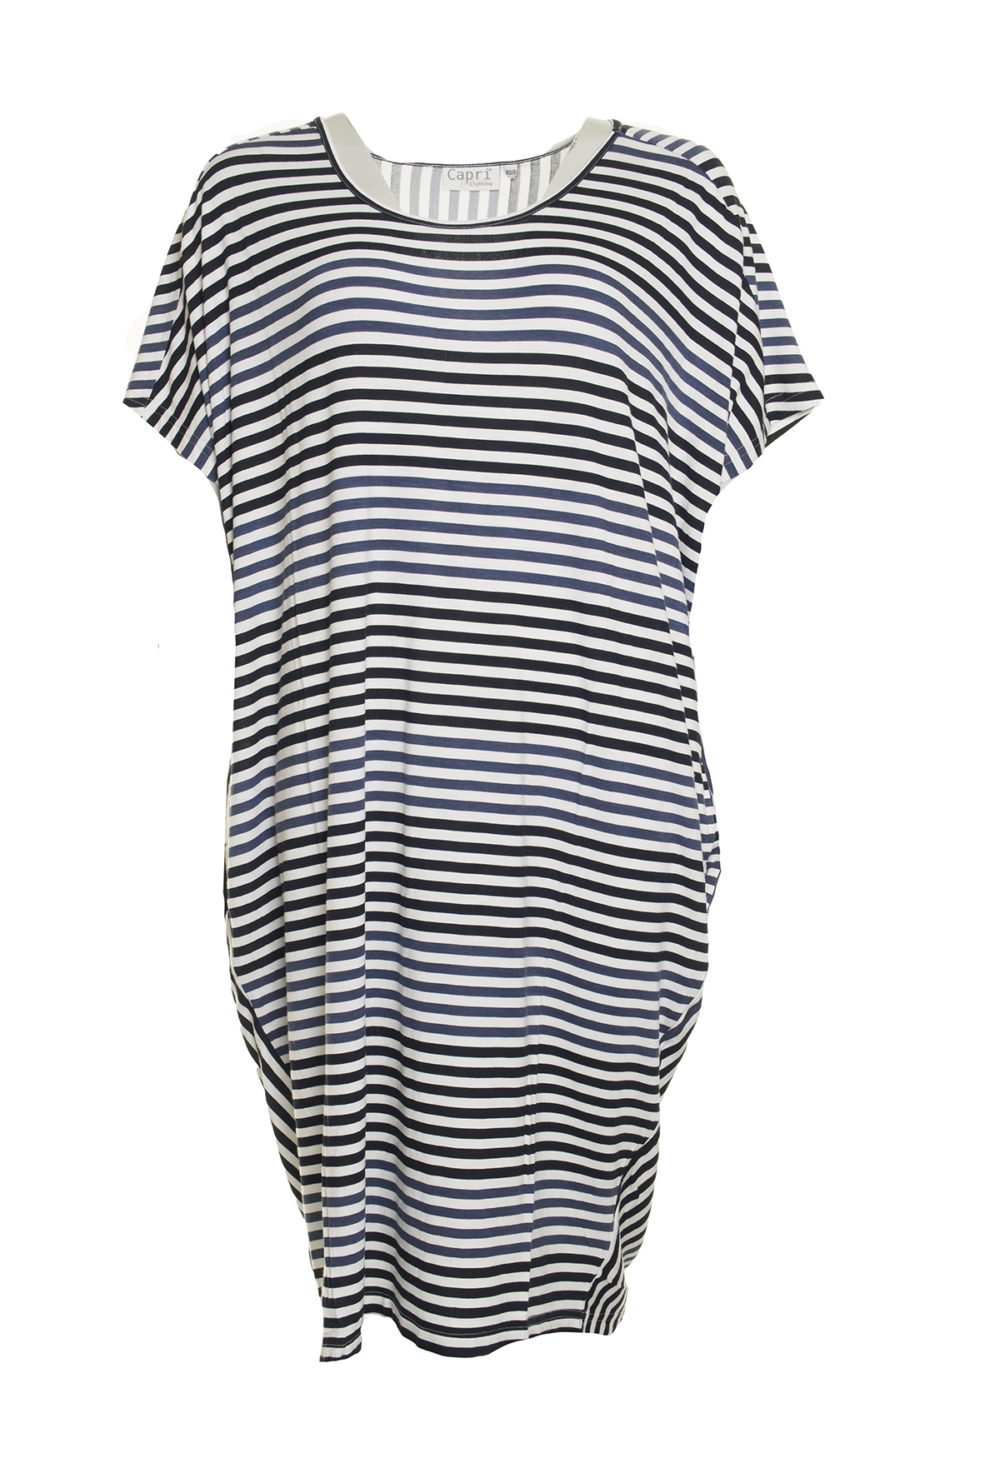 Dress PSA-9018 Capri Katie Kerr Women's Clothing